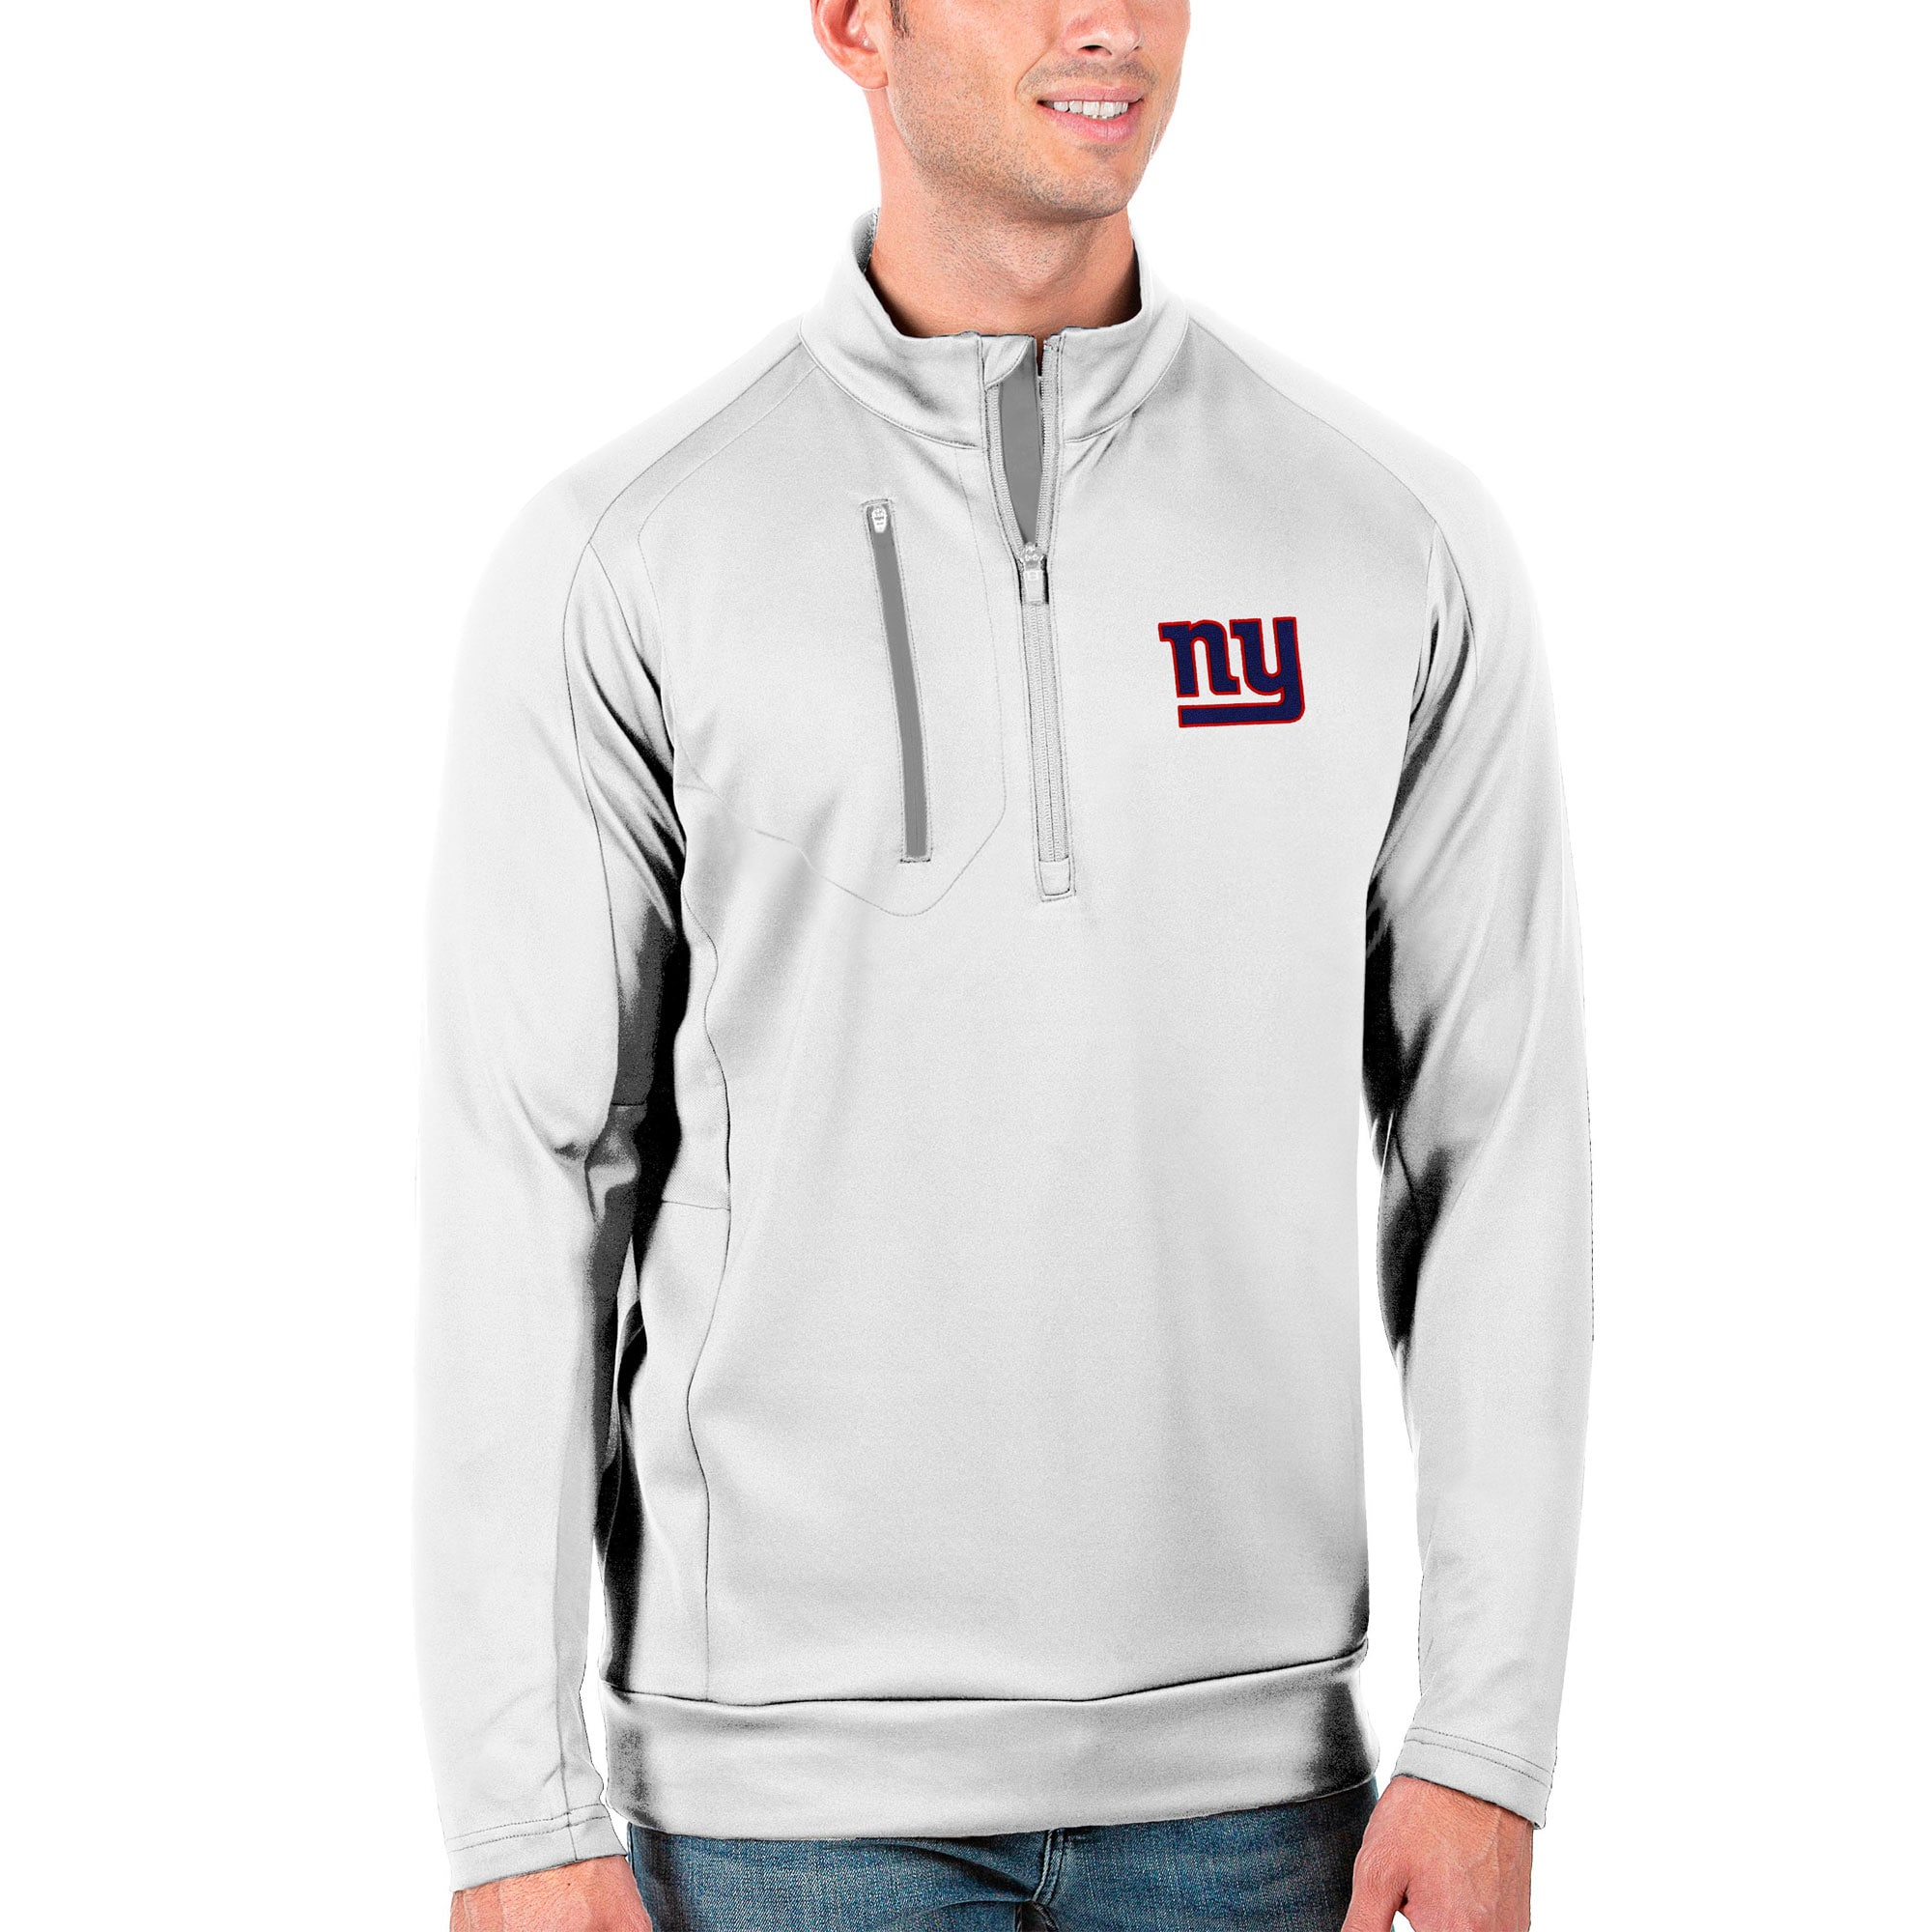 New York Giants Antigua Generation Quarter-Zip Pullover Jacket - White/Silver